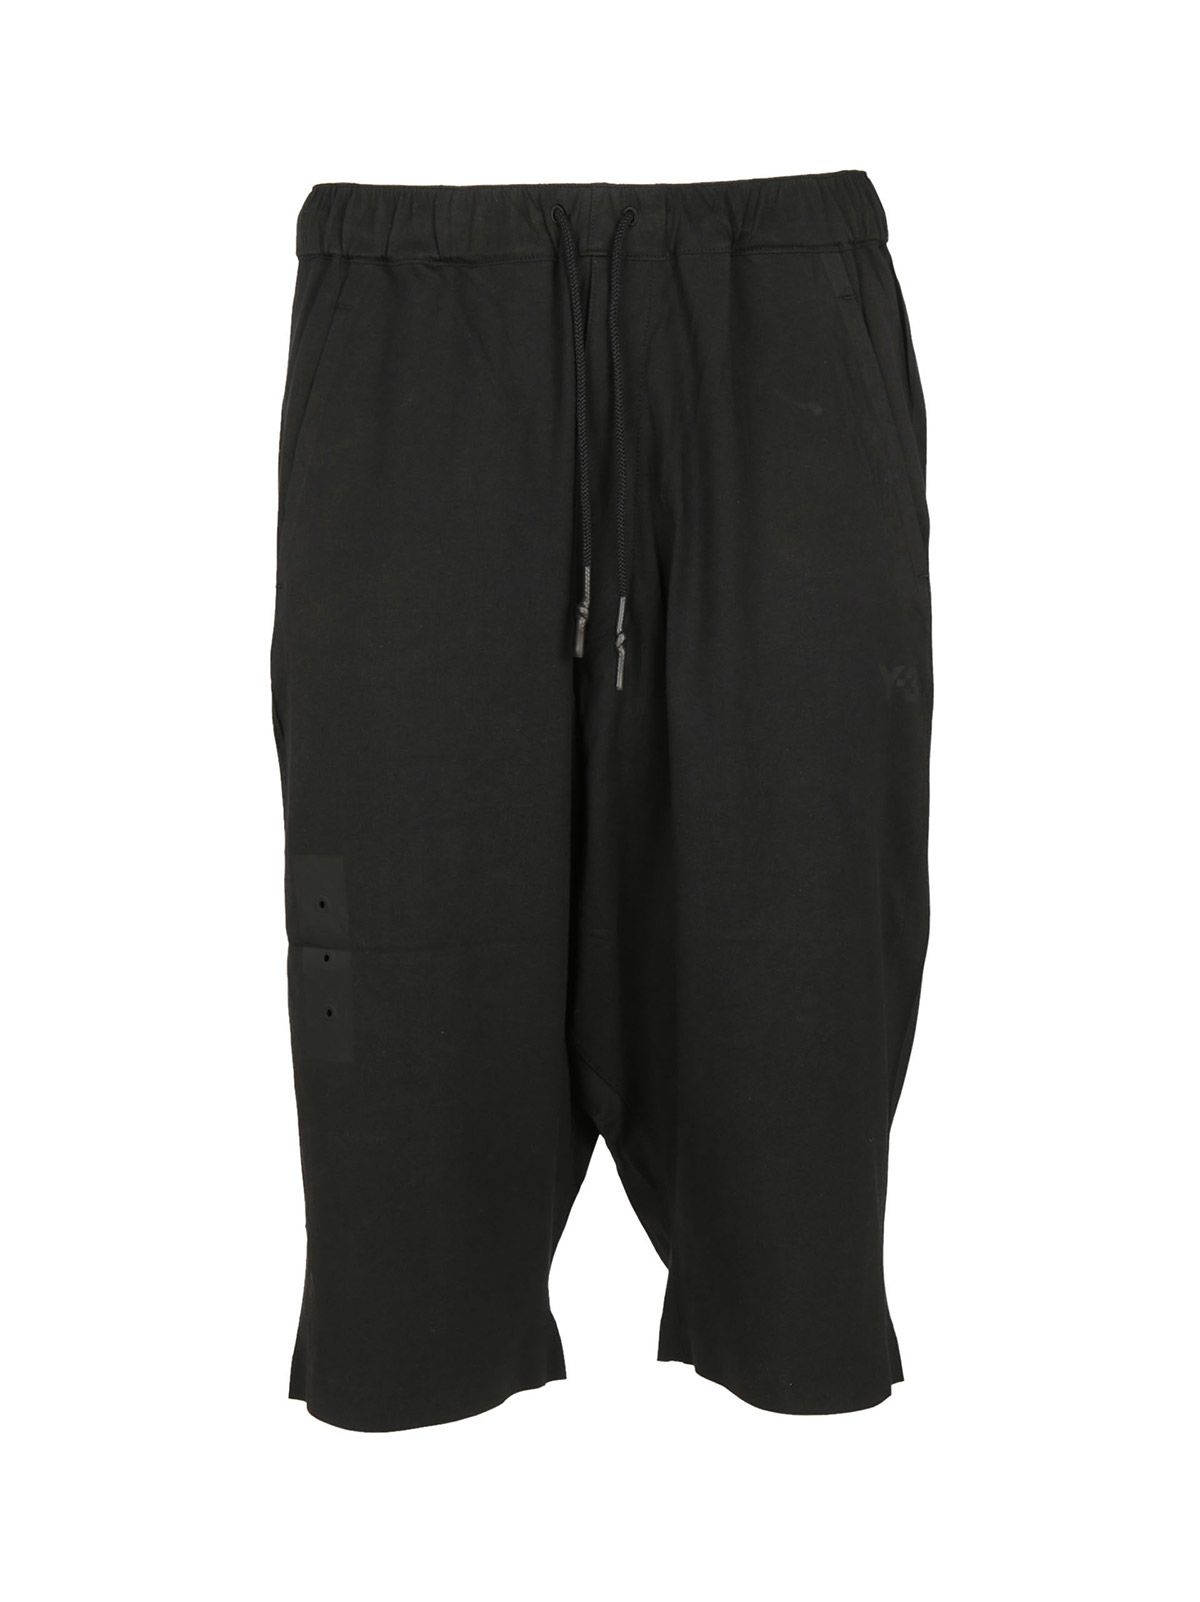 Skylight Shorts